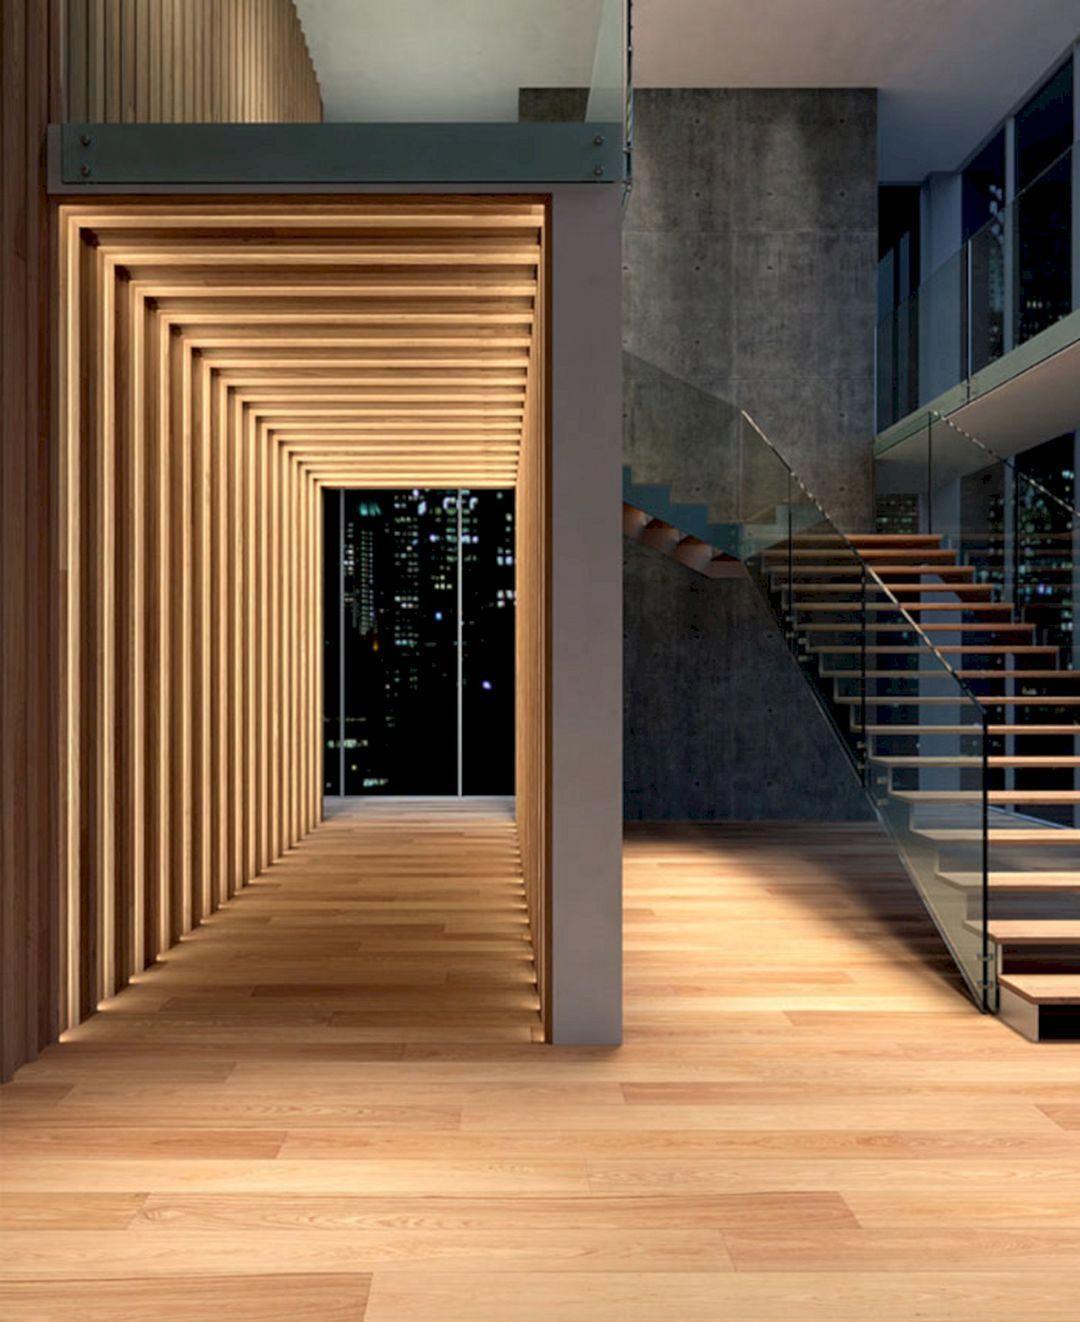 Natura Wohndesign: Home Decor Modern Age #Homedecormodern